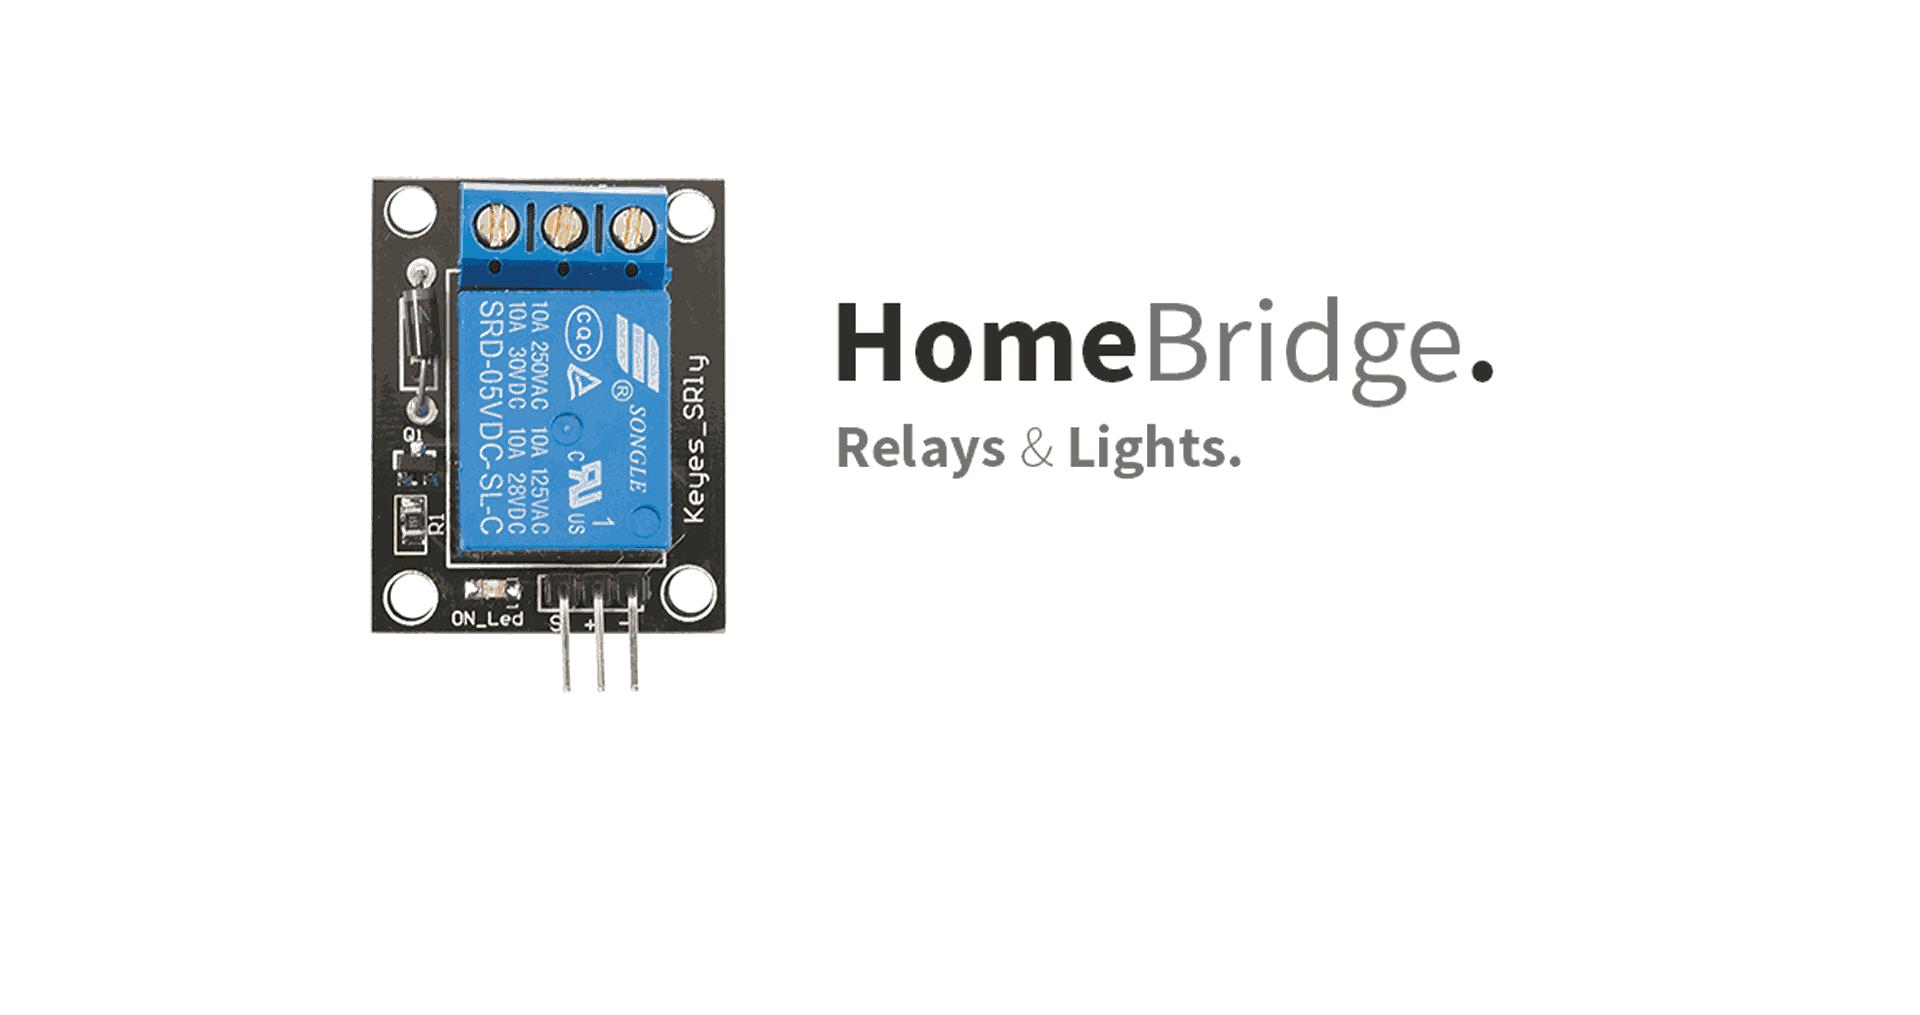 HomeBridge – Relays & Lights